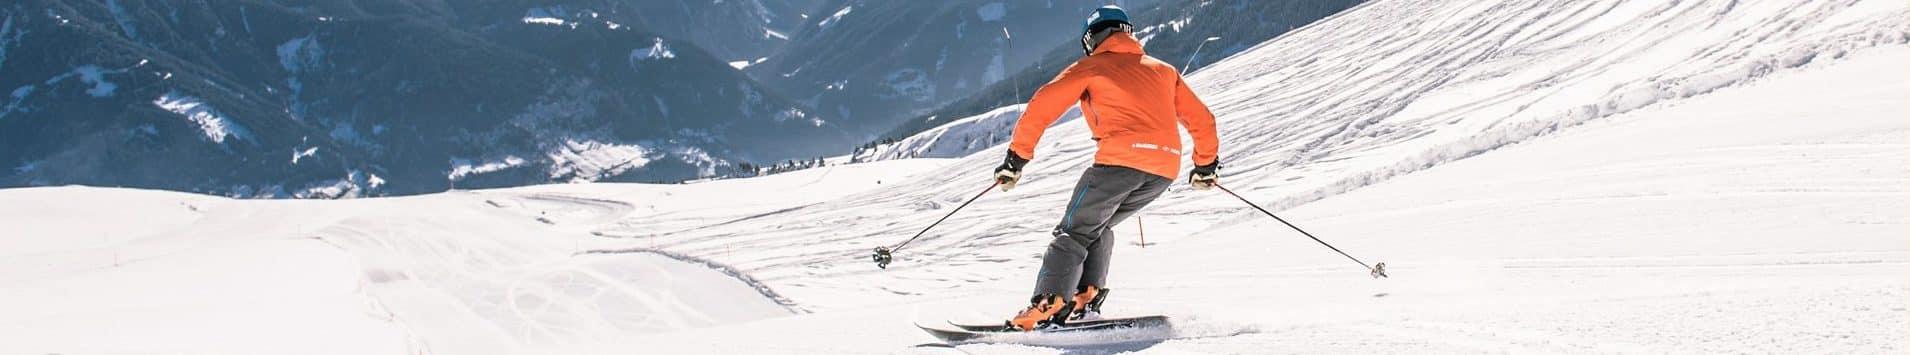 Calgary to Panorama BC Ski Resort Transportation